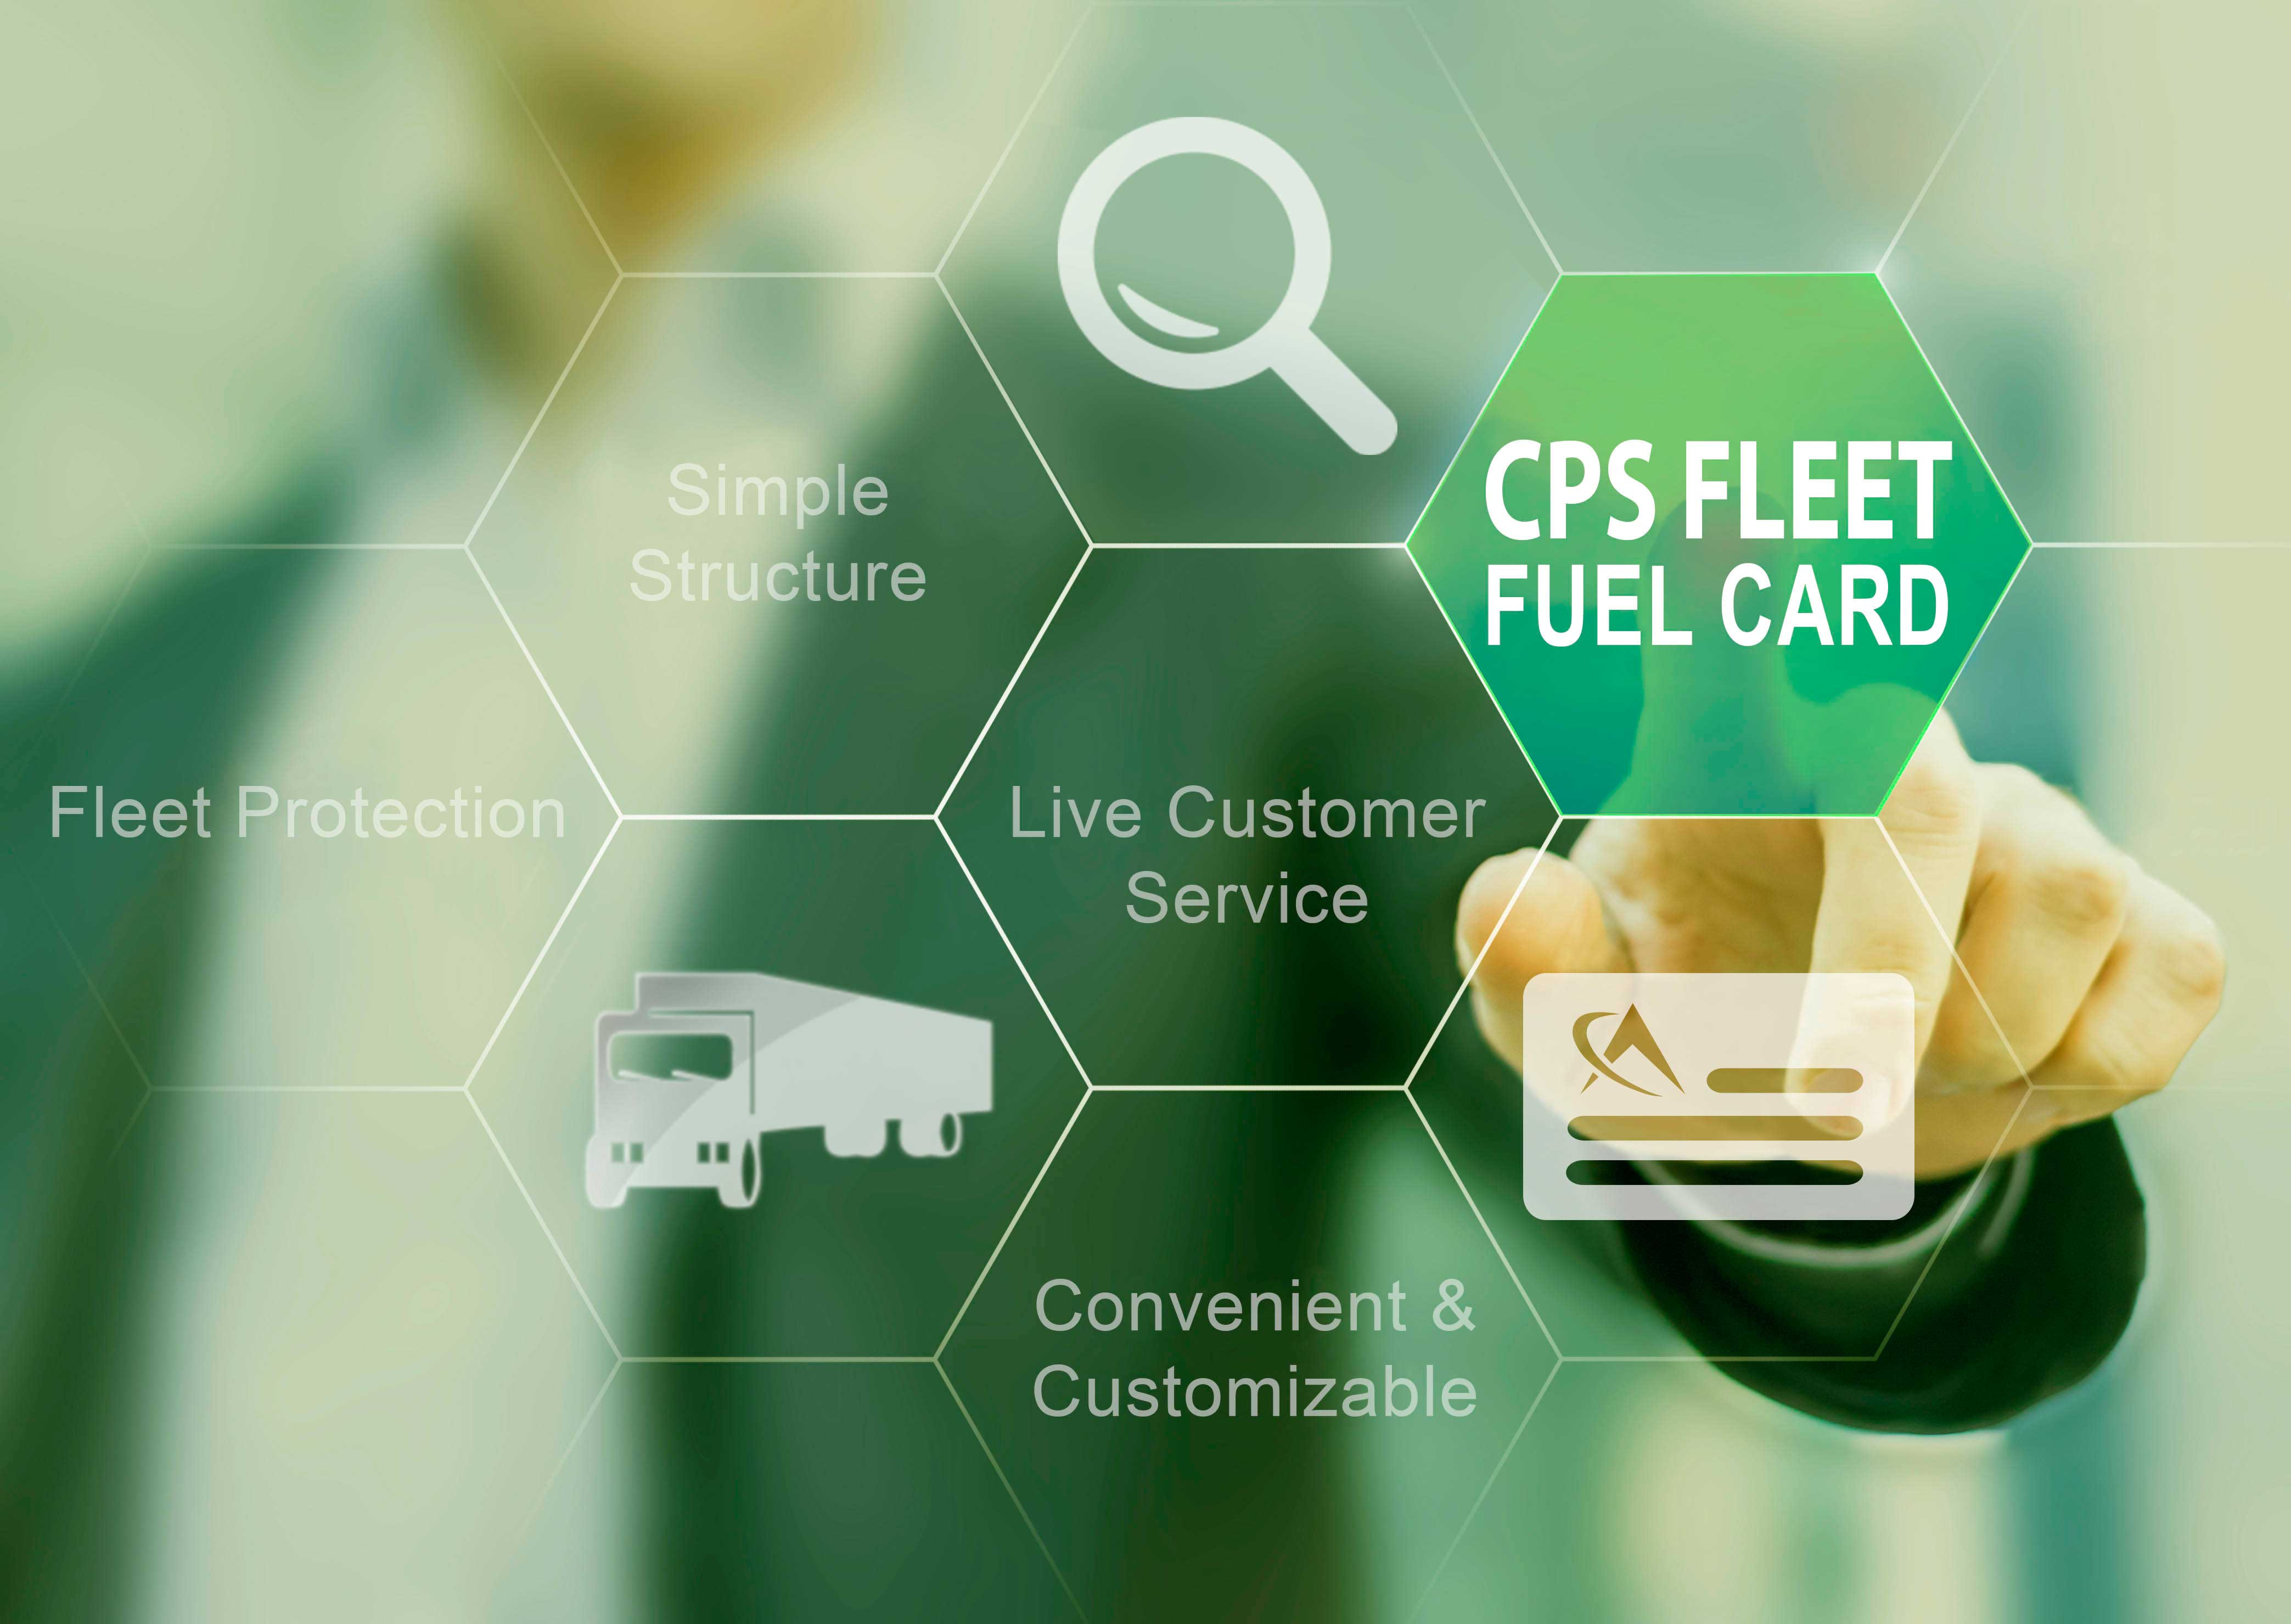 fleet fuel card in illinois - Best Fleet Fuel Cards